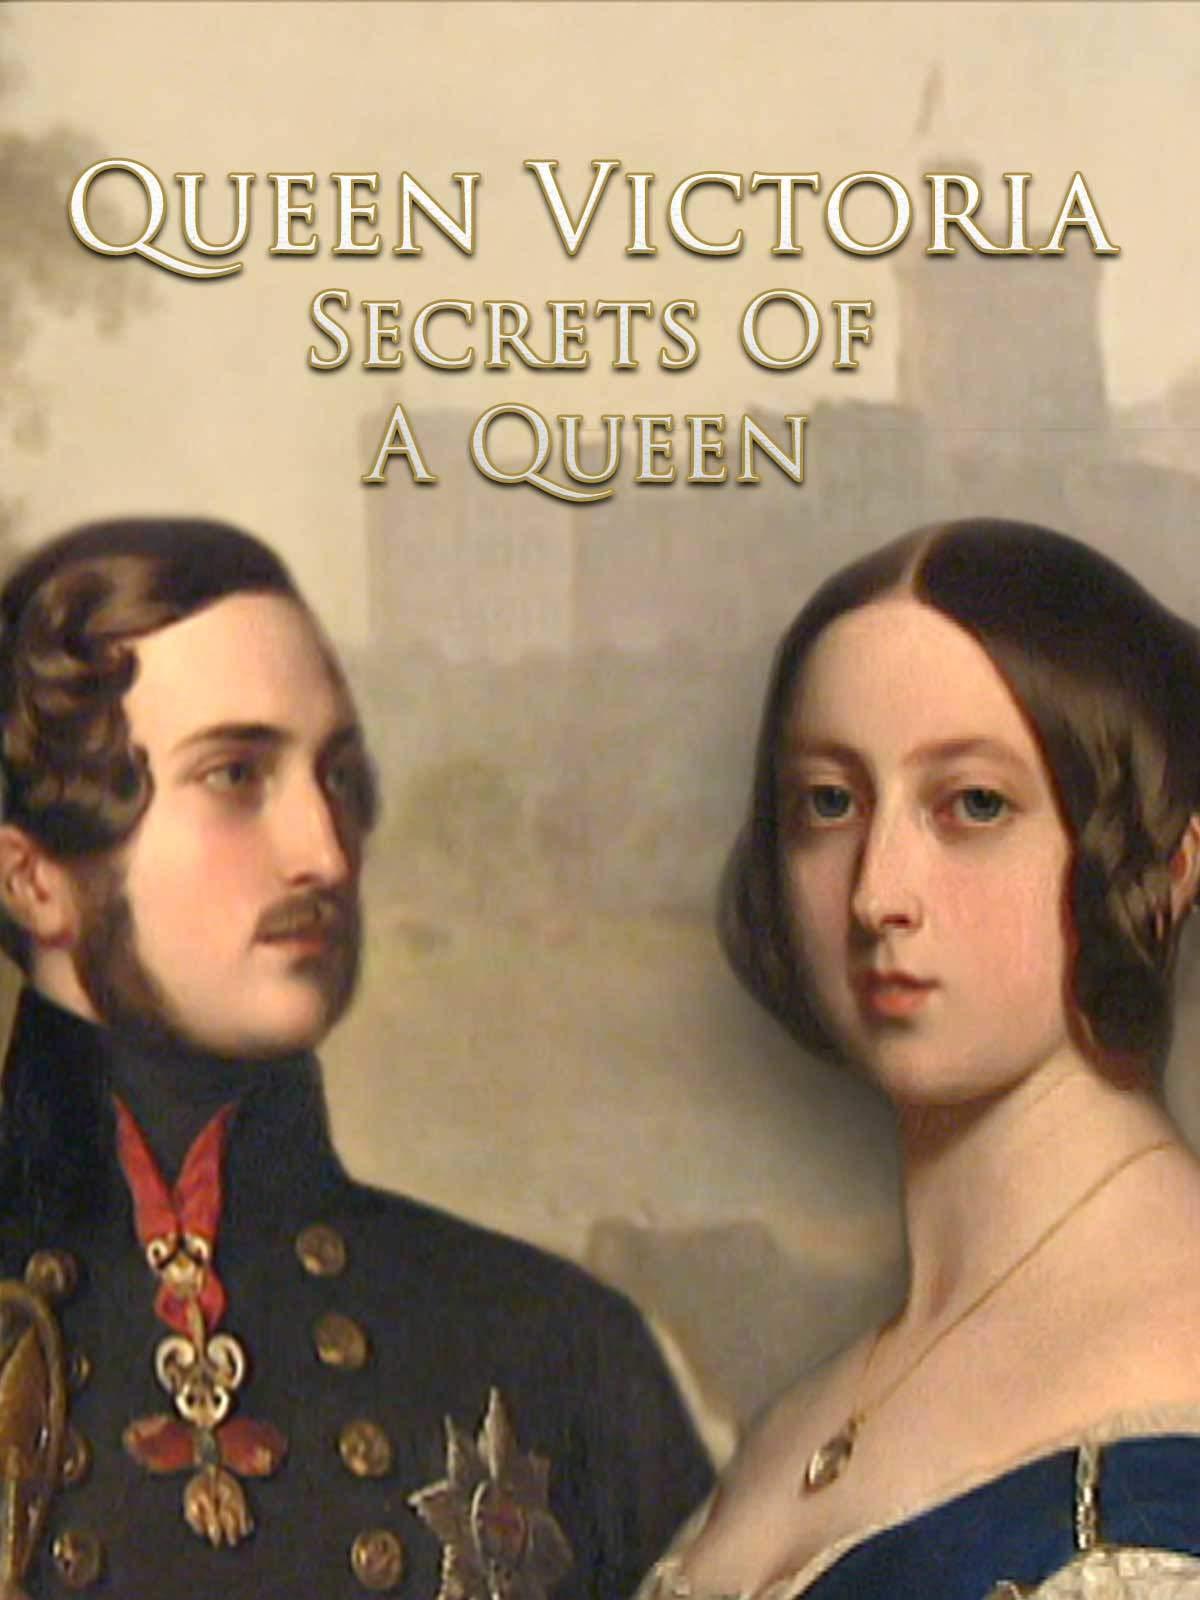 Queen Victoria - Secrets Of A Queen